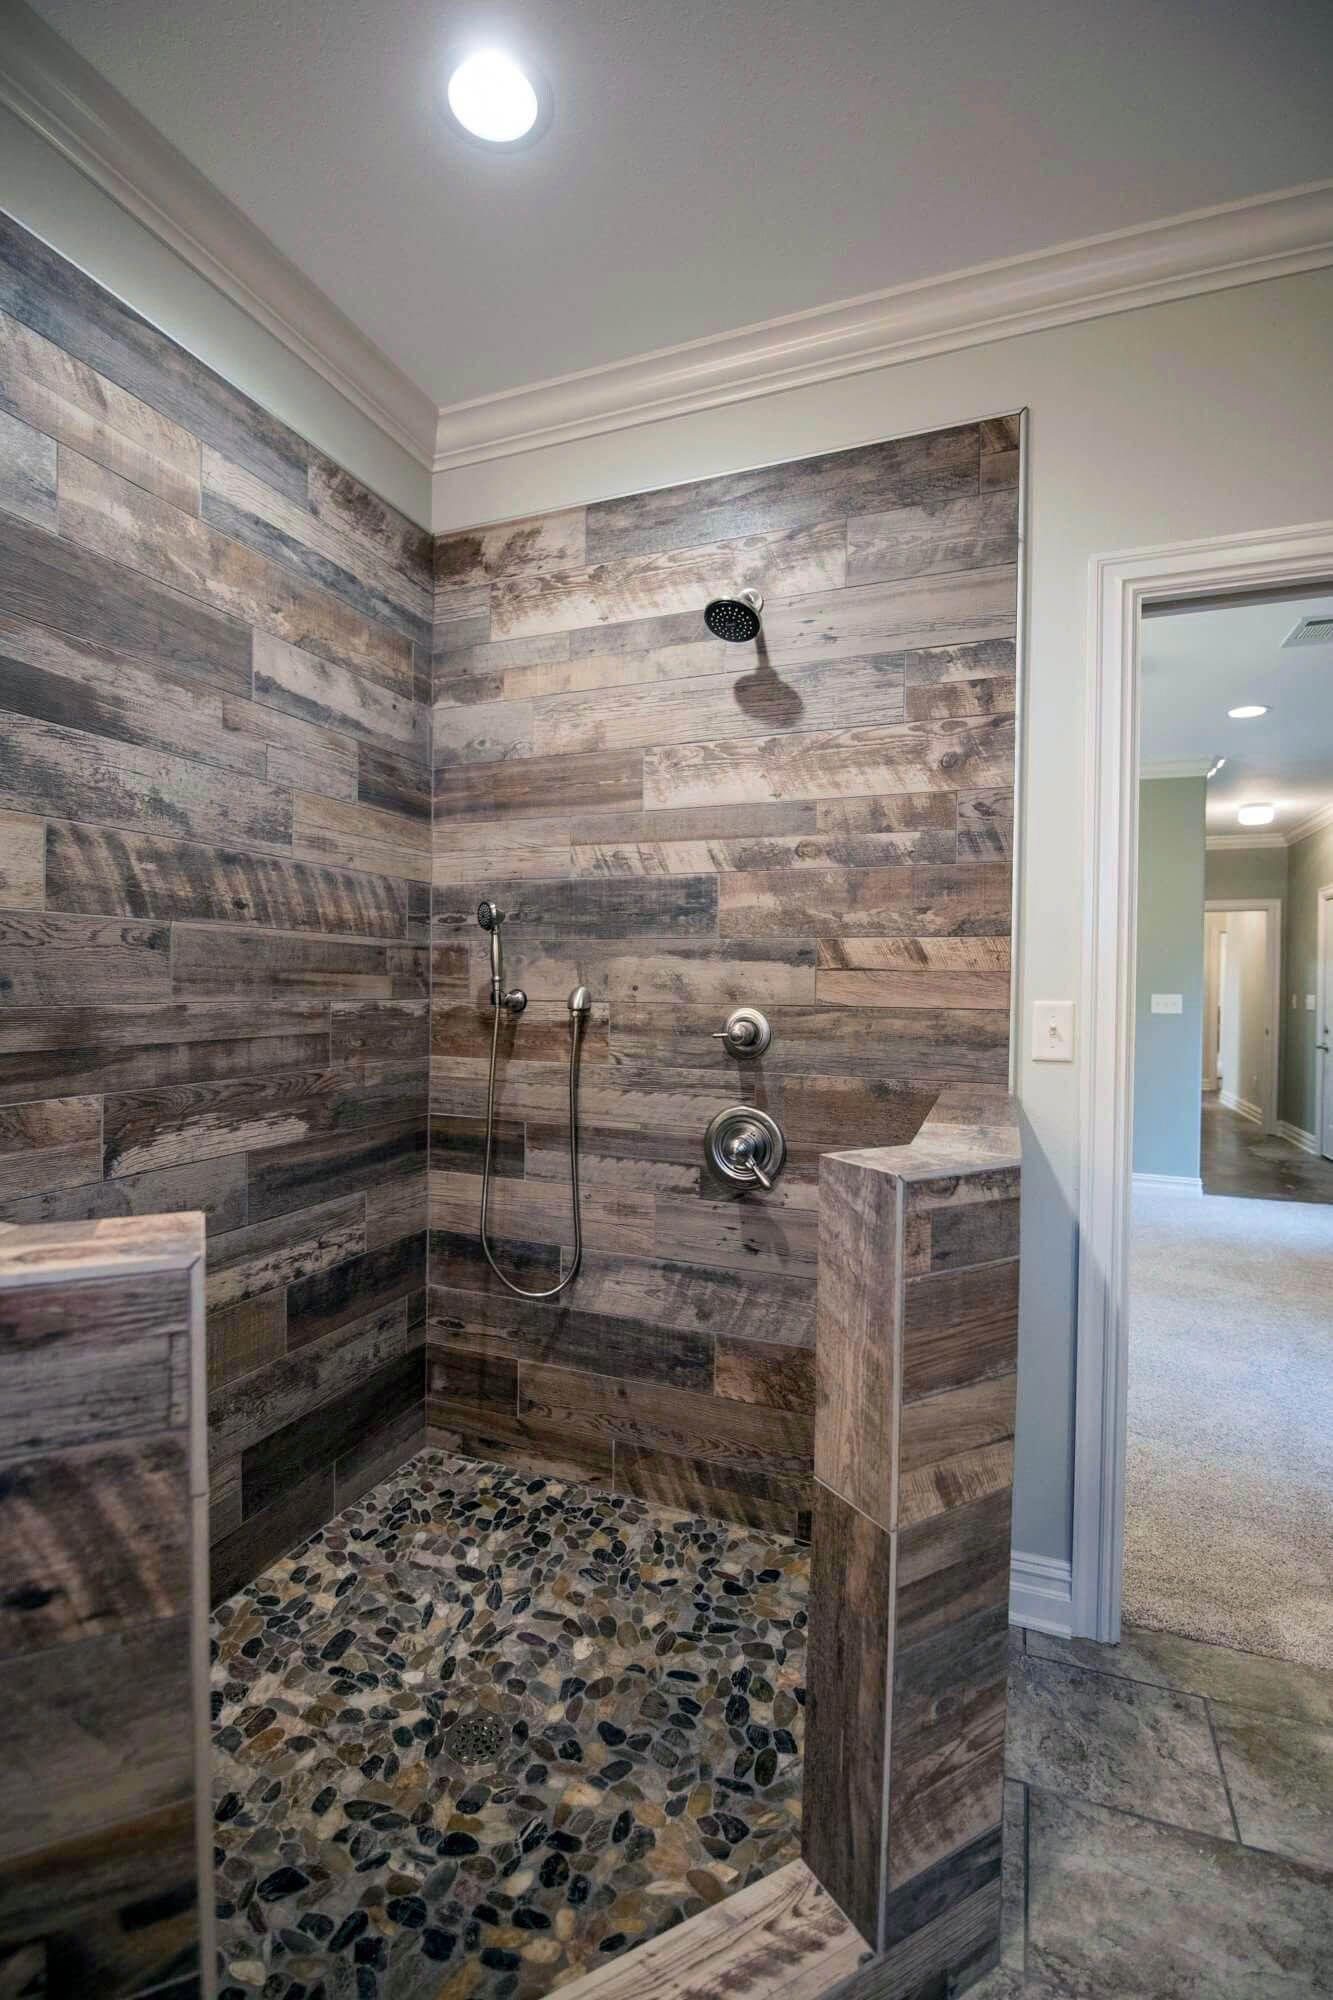 What About This For A Creative Idea Pretty Bathroom Ideas In 2020 Rustic Master Bathroom Bathroom Remodel Shower Rustic Bathroom Shower